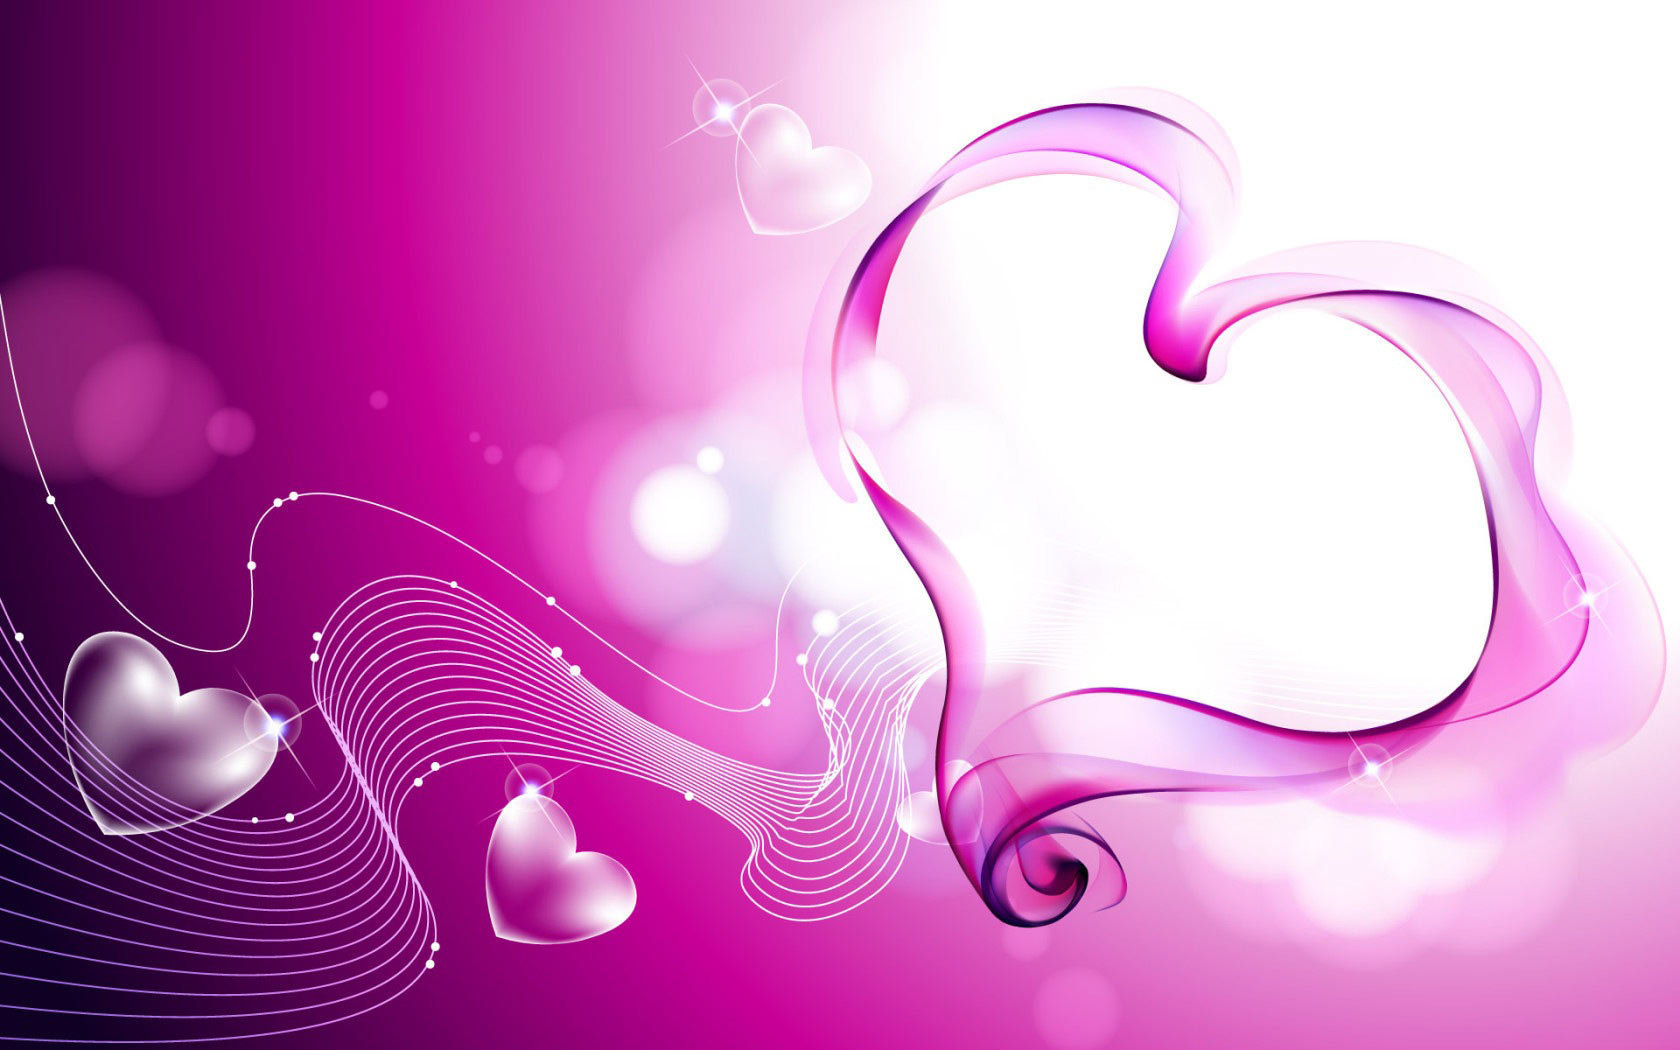 lots-of-love-love-19596601-1680-1050